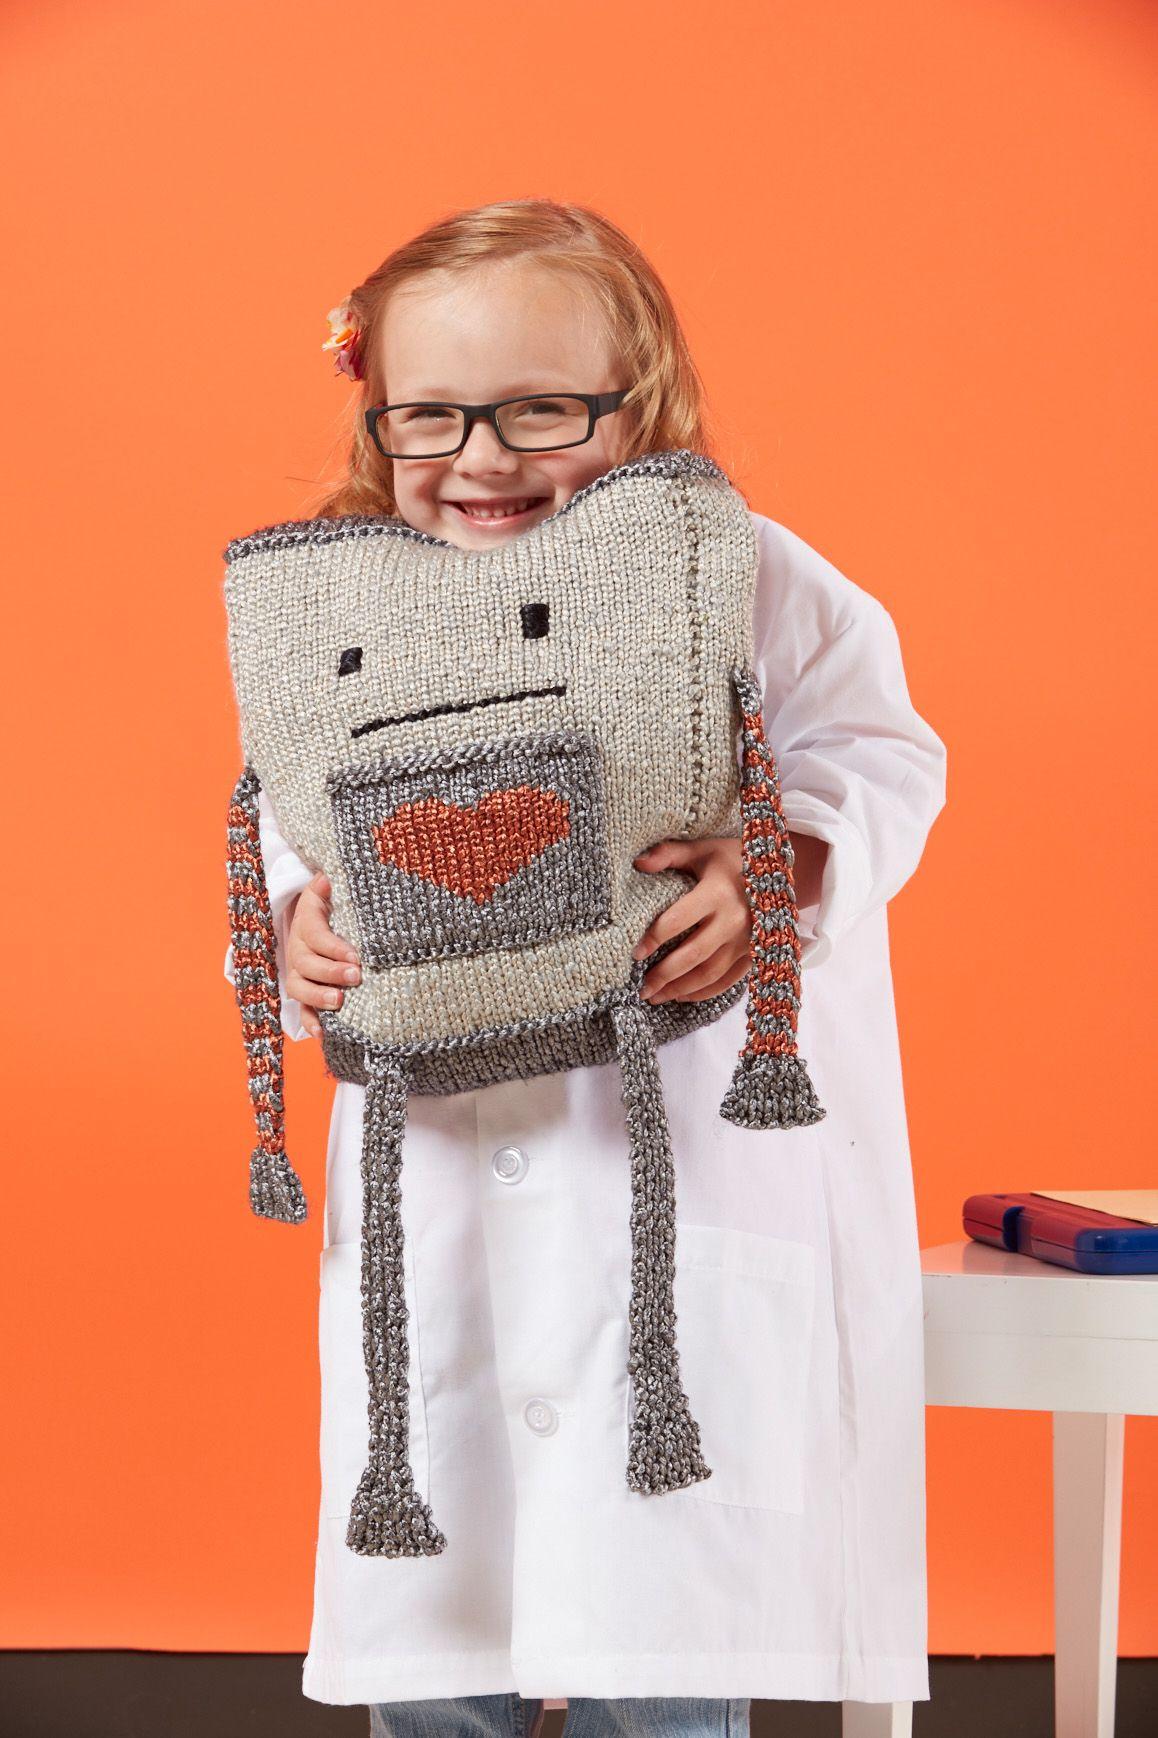 Mr Robotics Knitted Toys Pinterest Crocheted Toys Knit